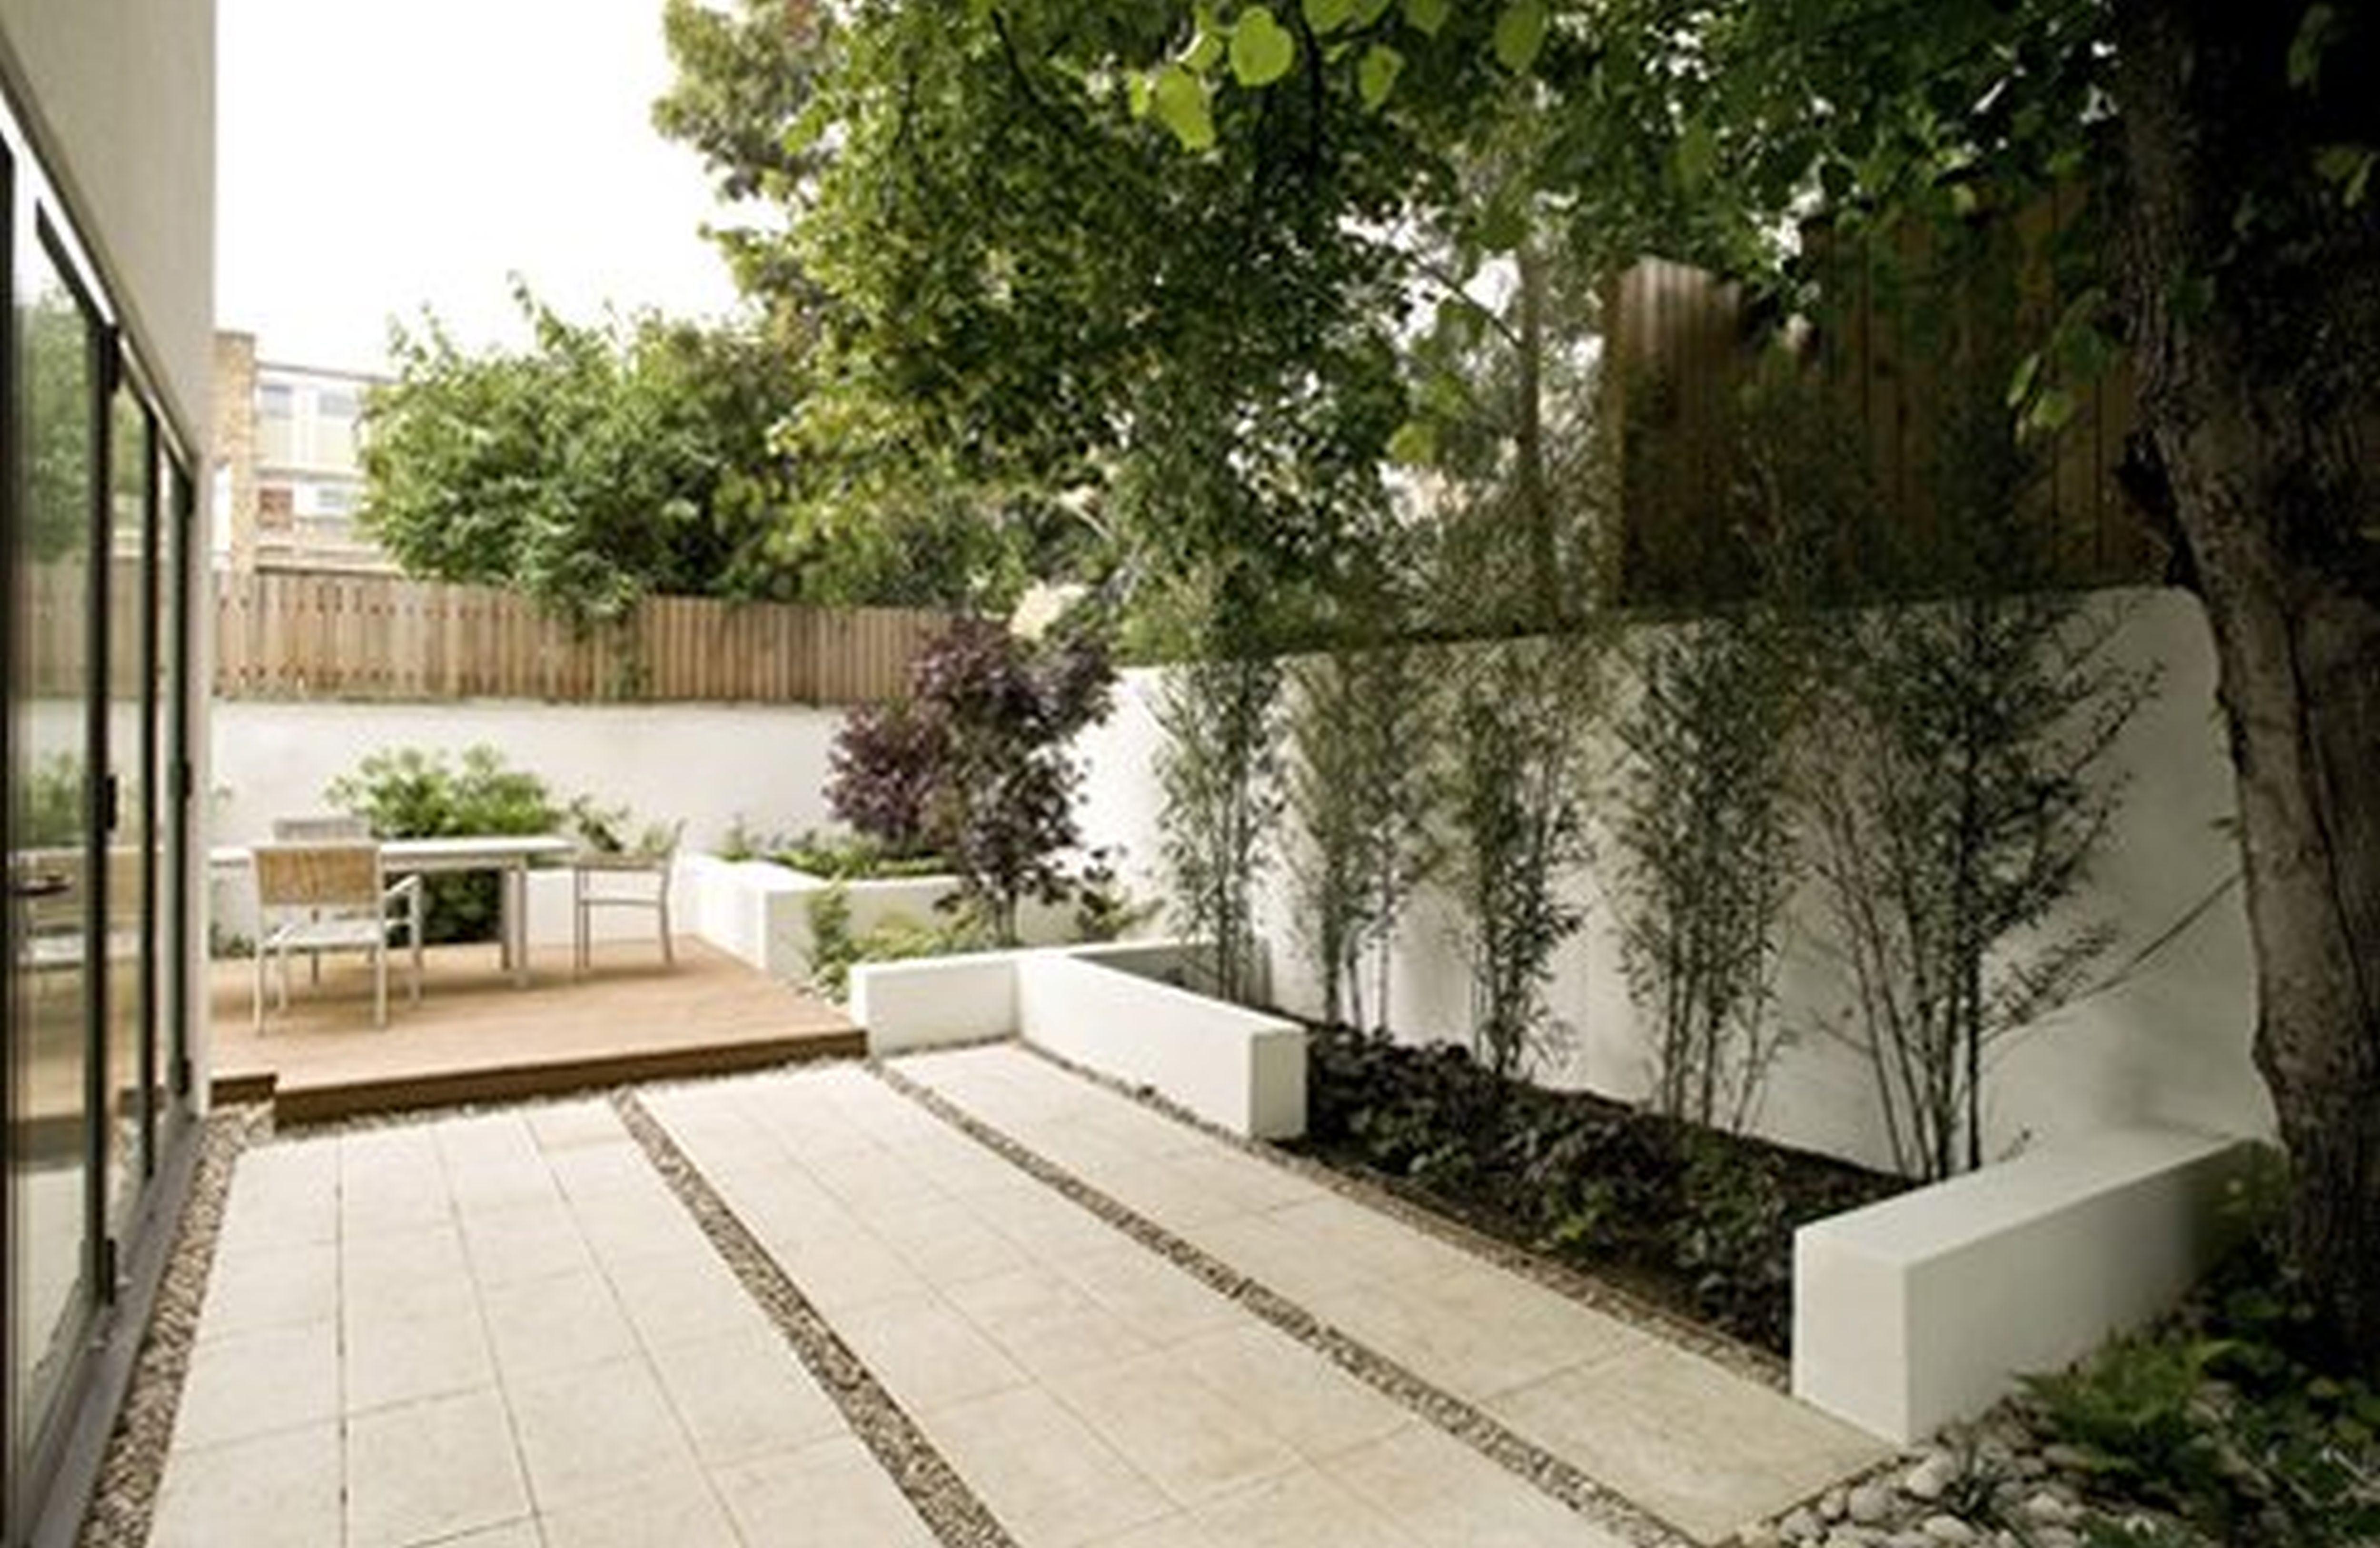 Landscaping Design And Diy Garden Planing Ideas For Small And Large Gardens Backyards Retain Small Urban Garden Urban Garden Design Small Urban Garden Design